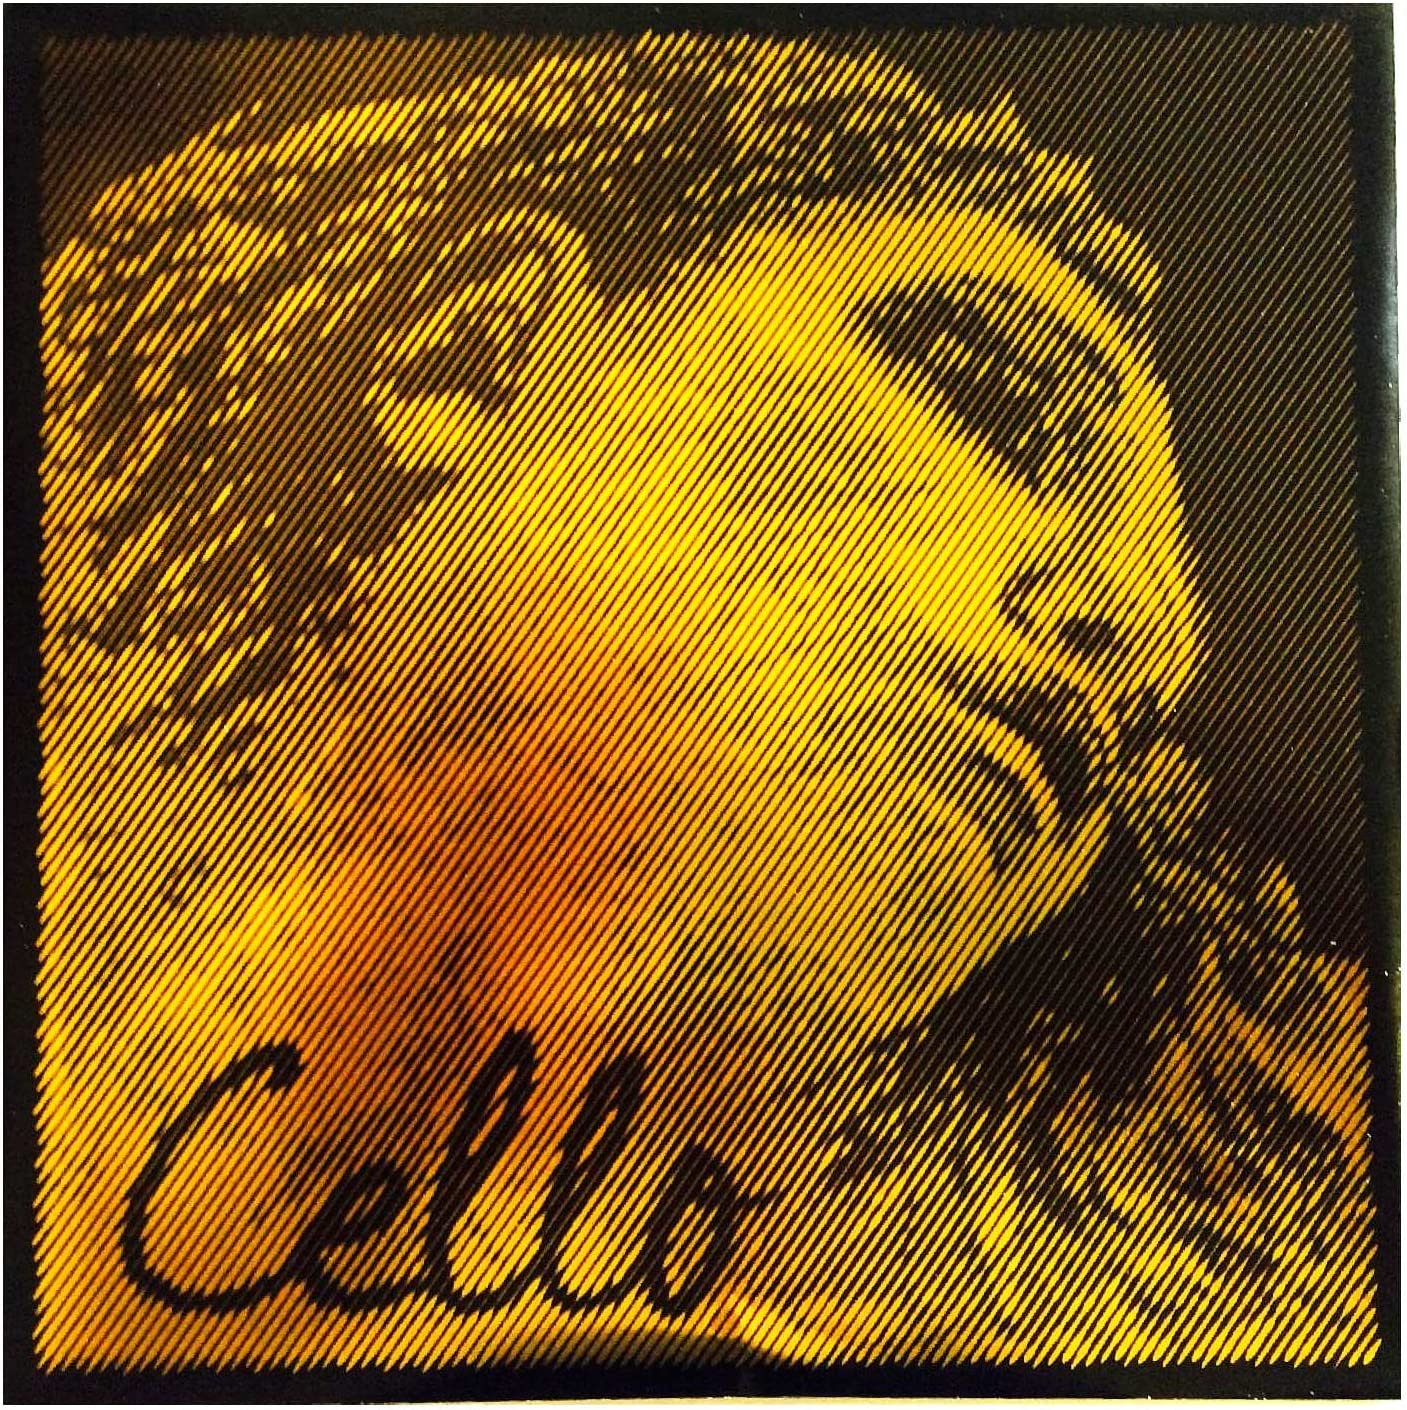 Pirastro Evah Pirazzi Gold 4 Cello - Gauge C Medium Limited price gift String